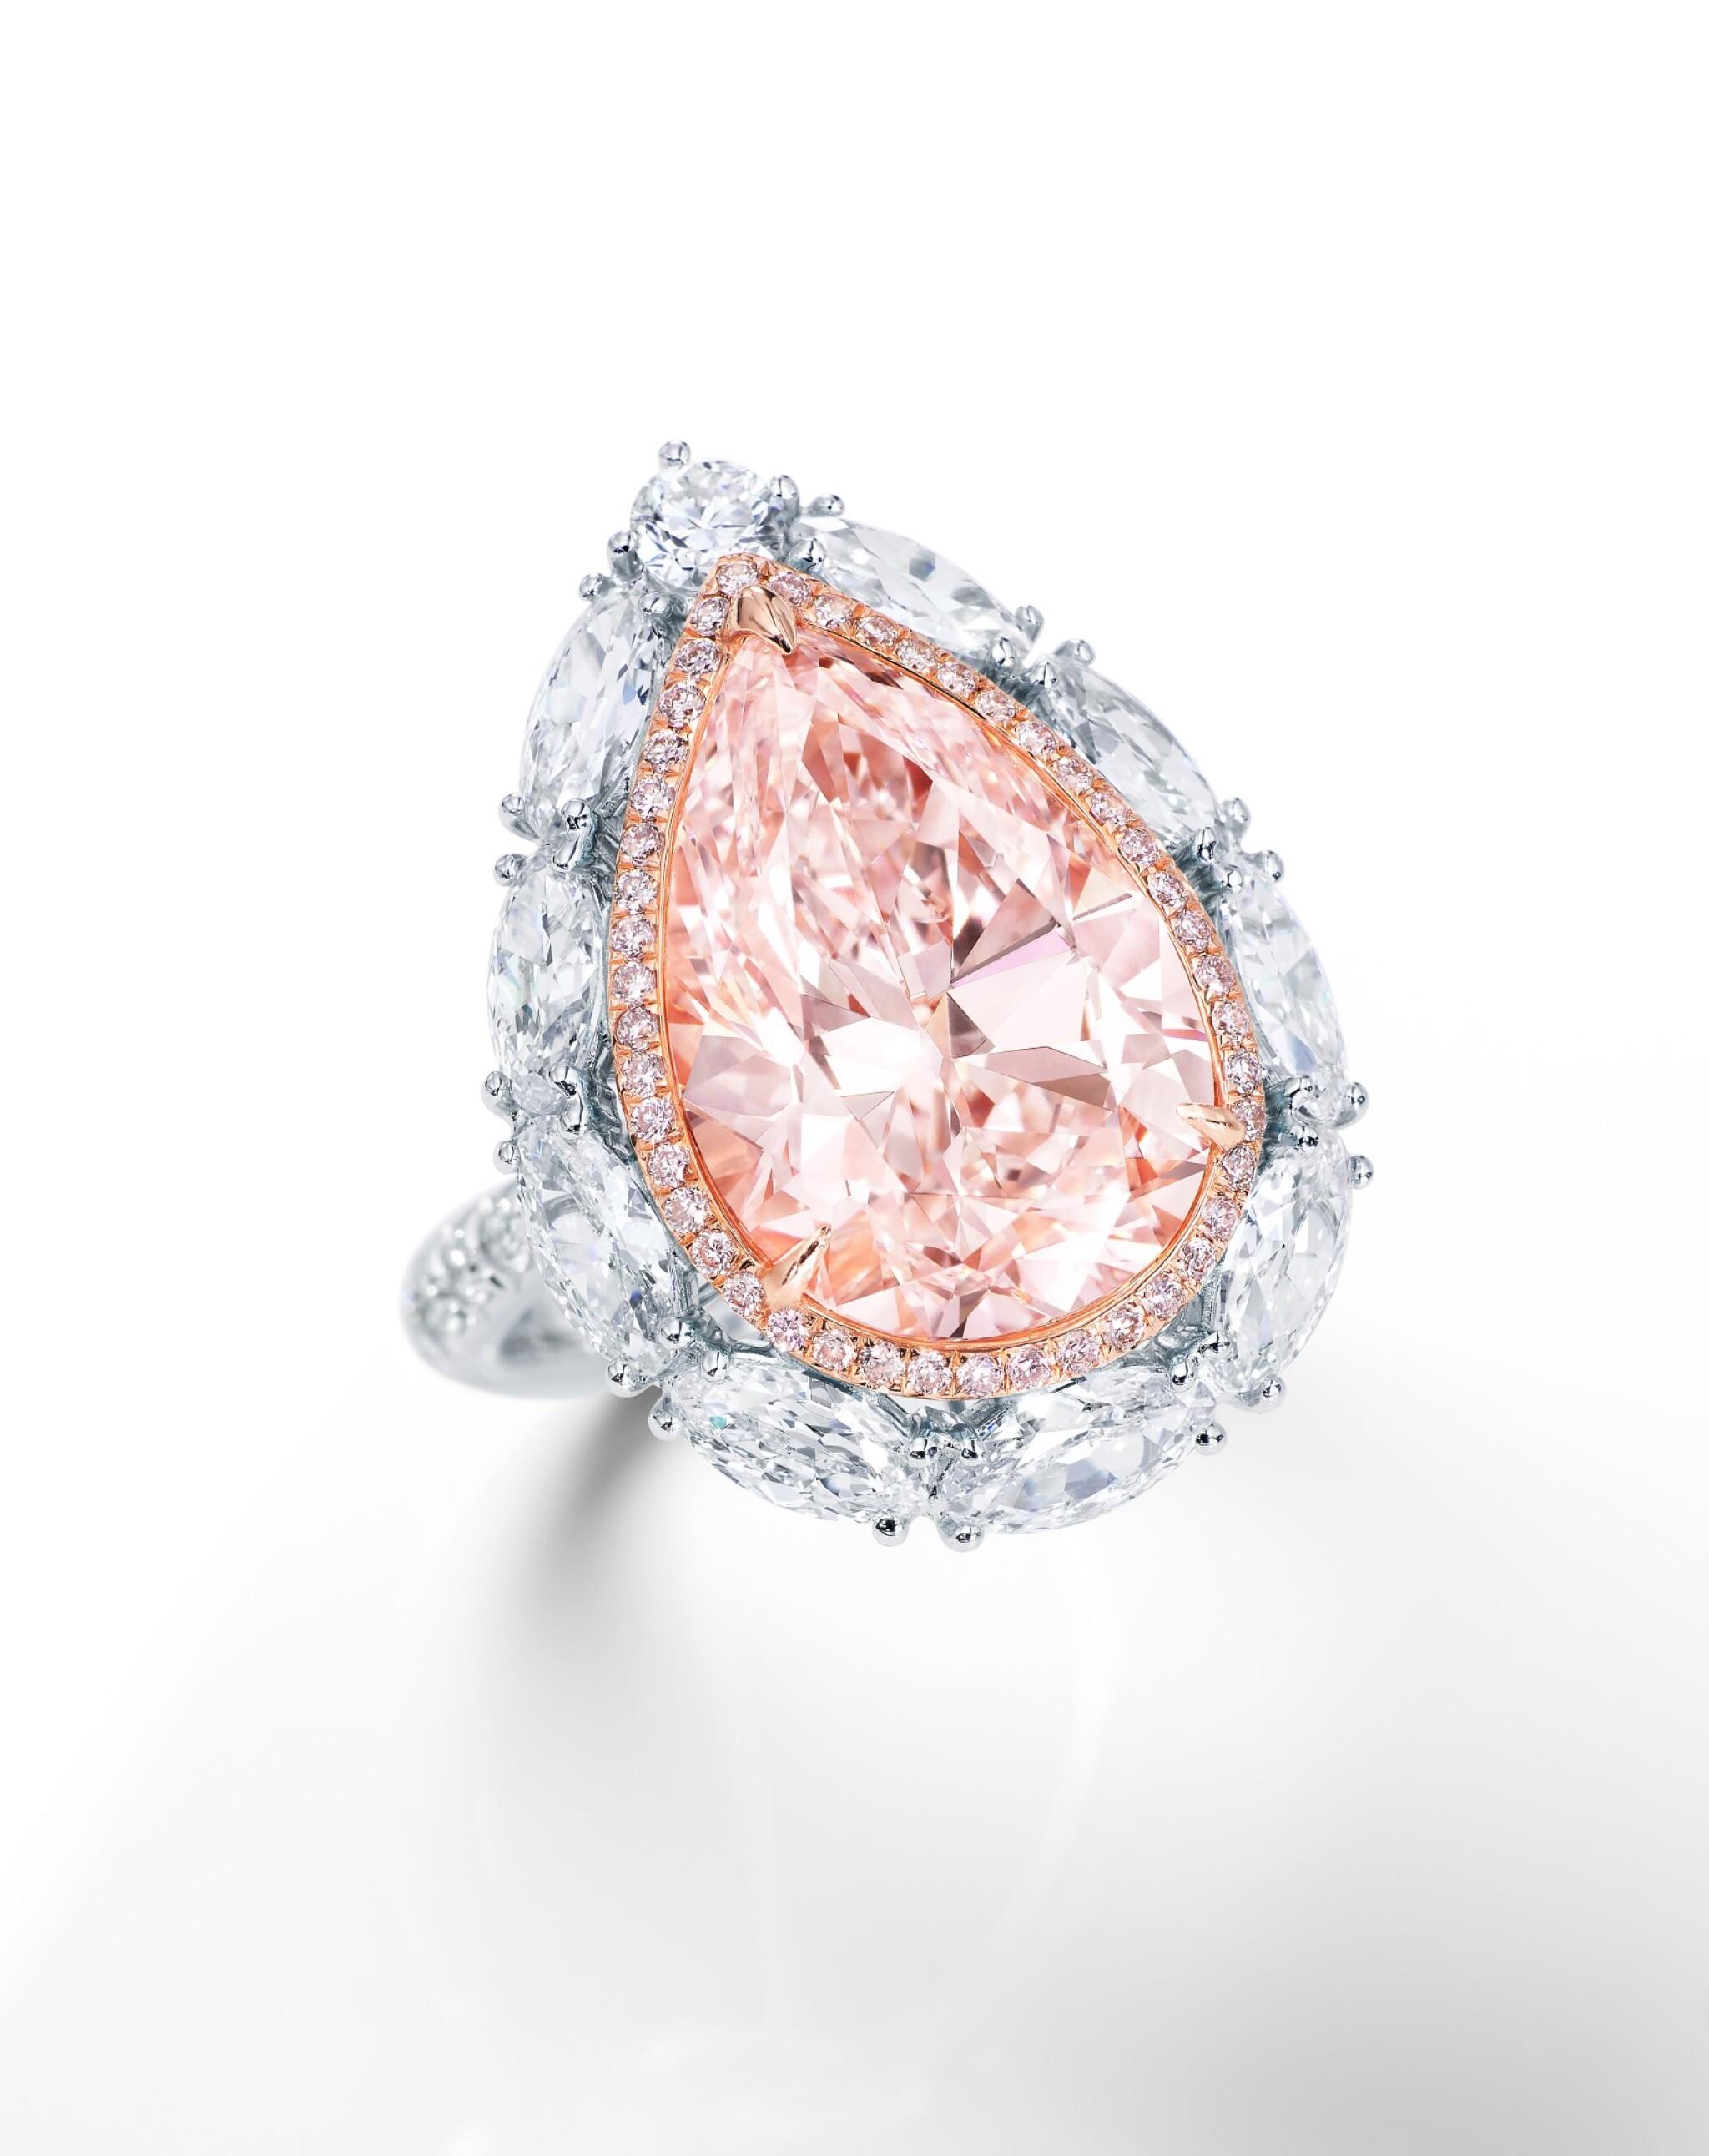 View full screen - View 1 of Lot 1618. LIGHT PINK DIAMOND AND DIAMOND RING | 7.33卡拉 淡粉紅色鑽石 配 鑽石 戒指.